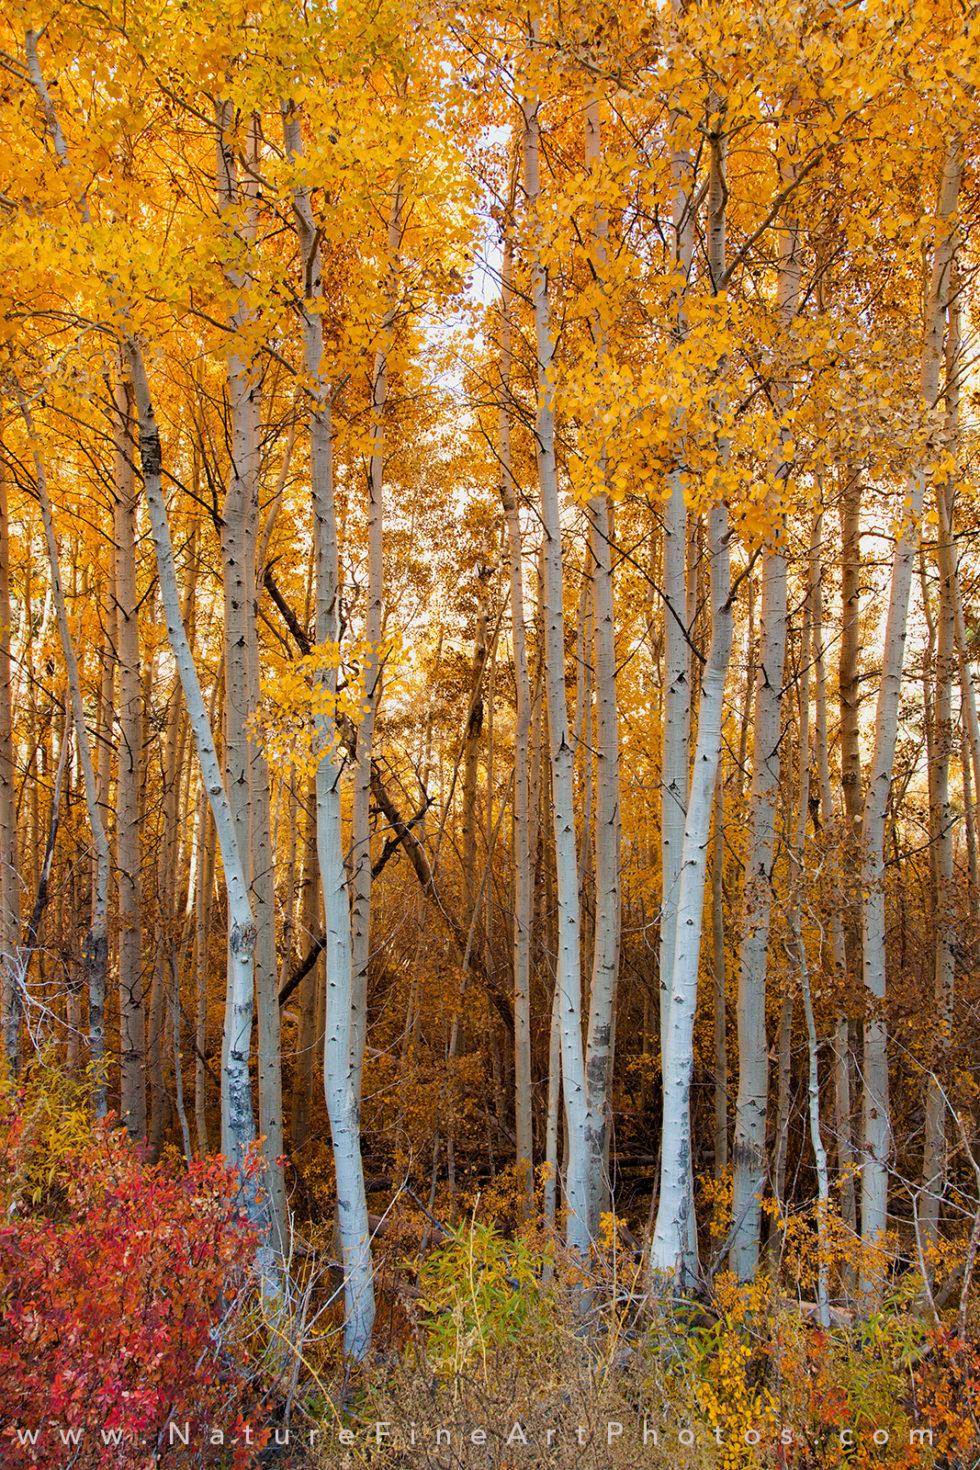 fall foliage aspen tree with fall colors